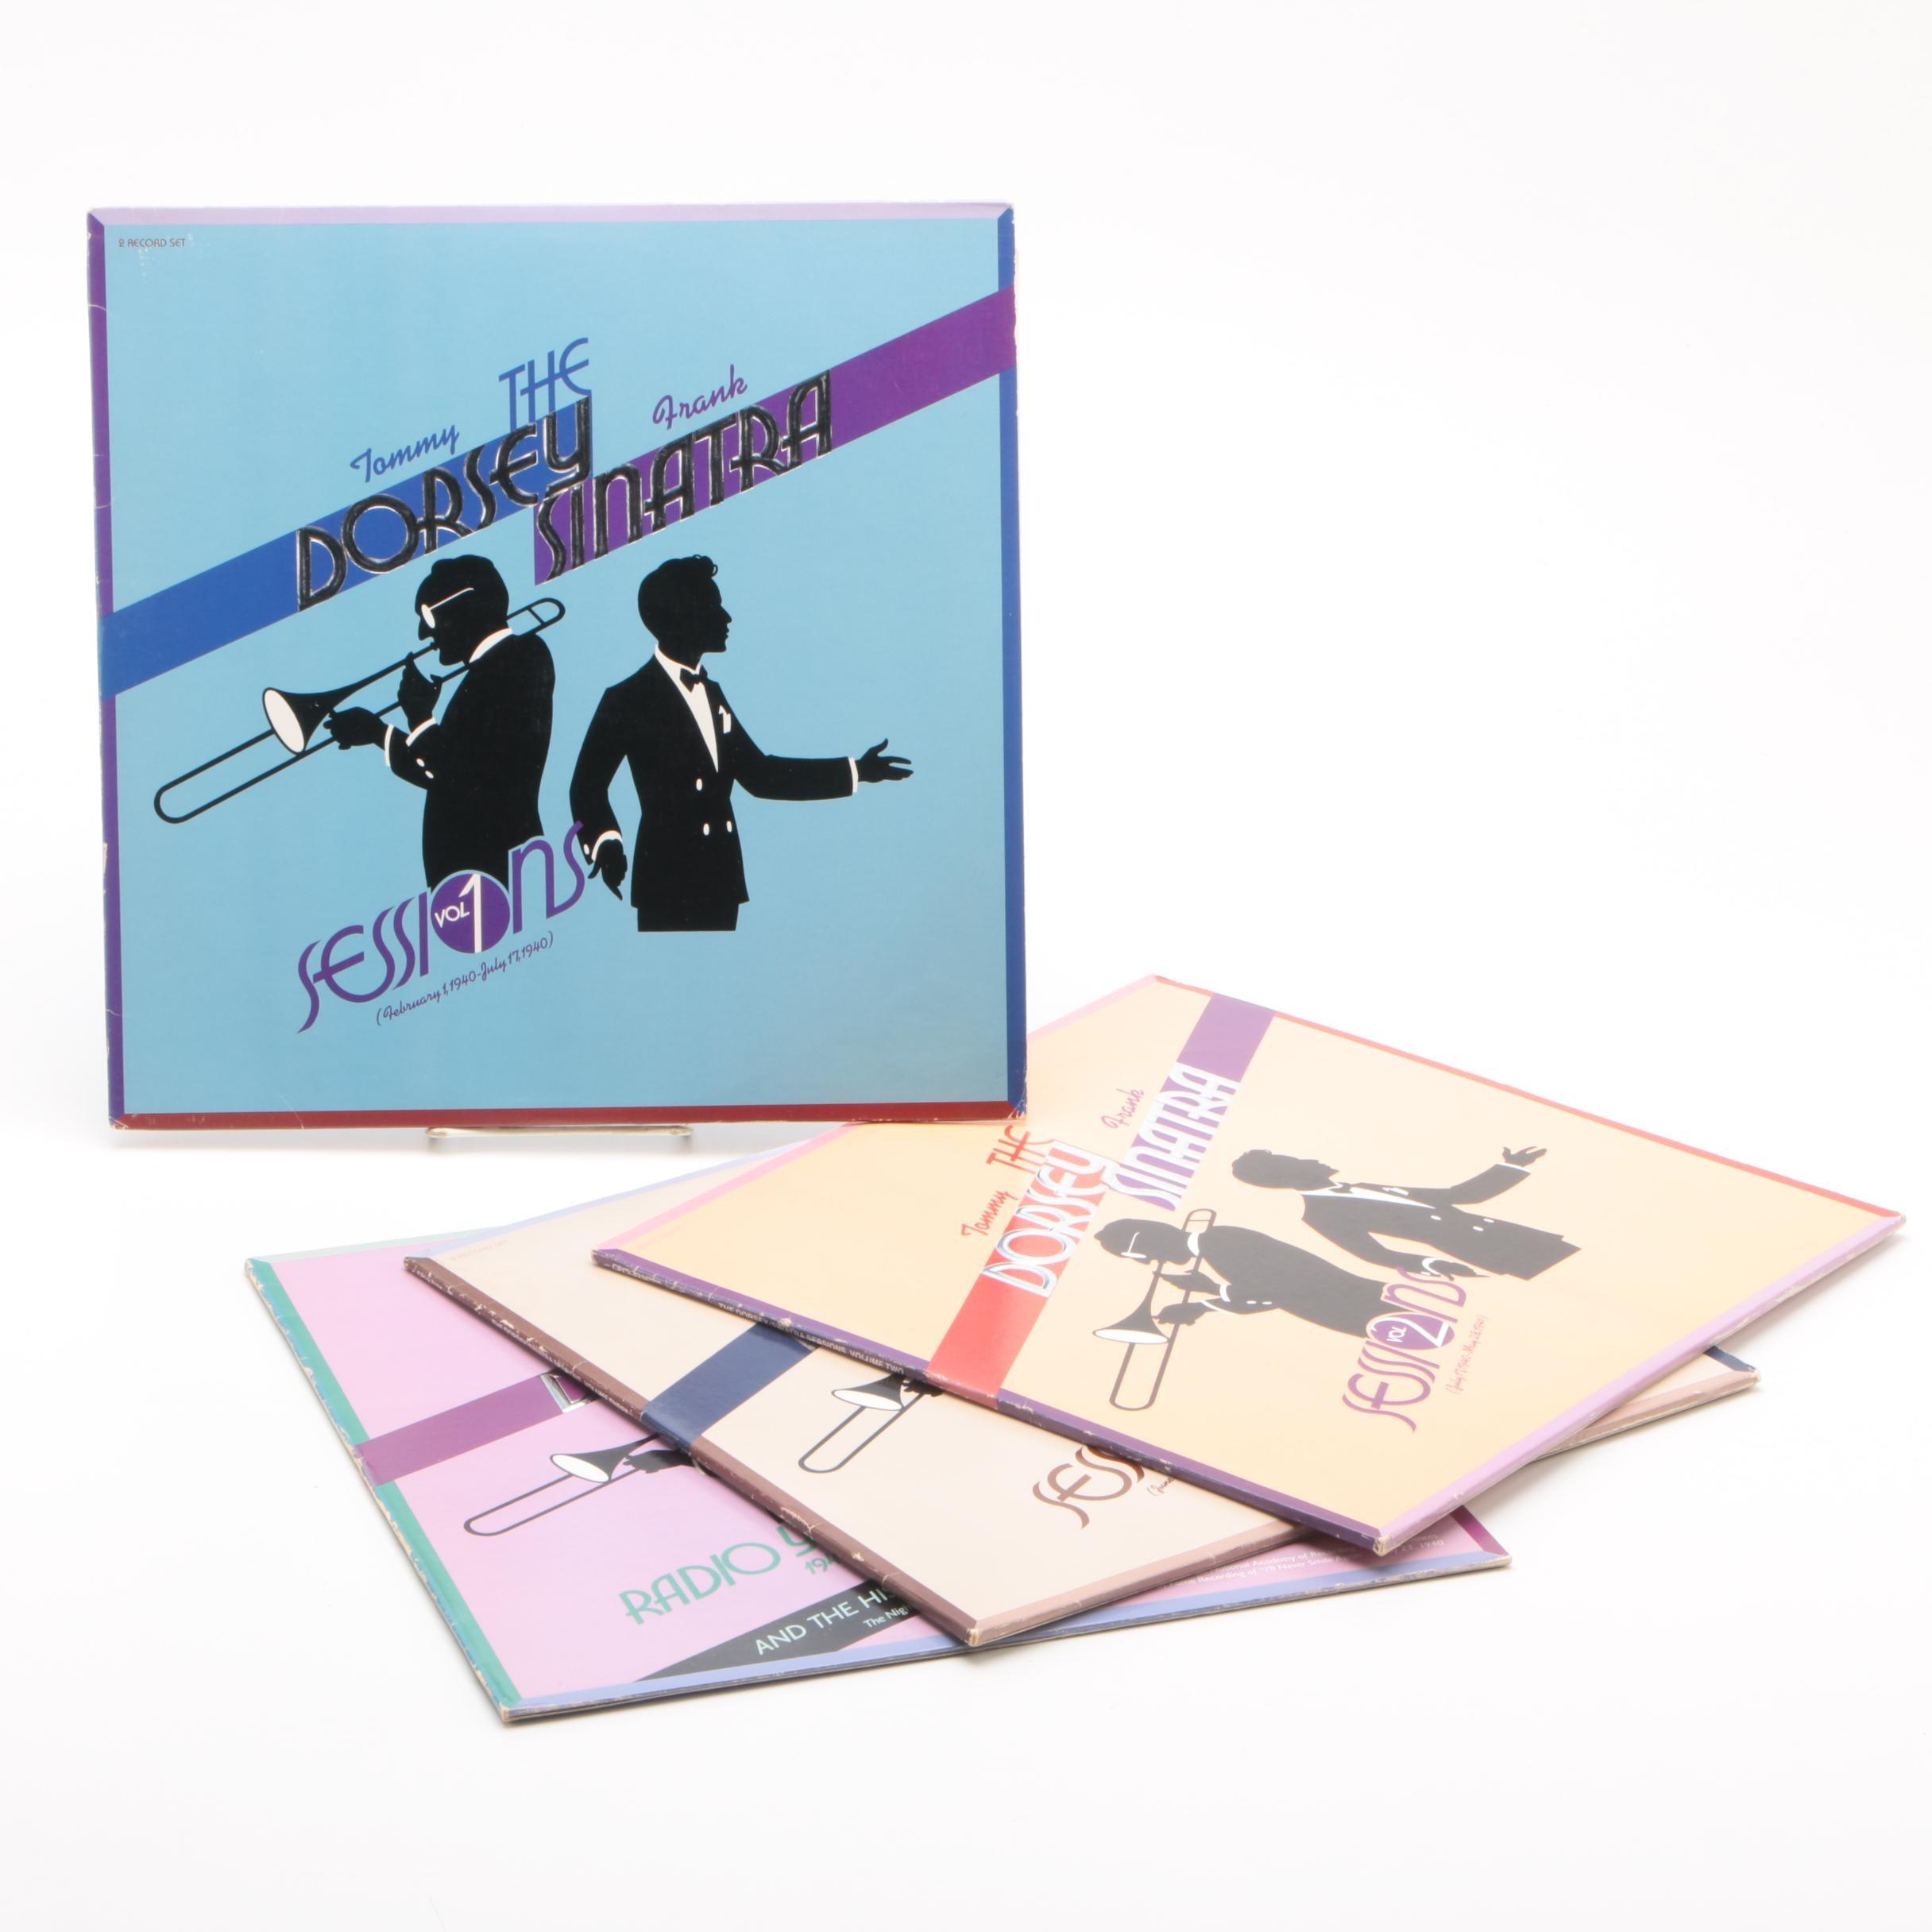 The Jimmy Dorsey/Frank Sinatra Sessions Vinyl Record Set